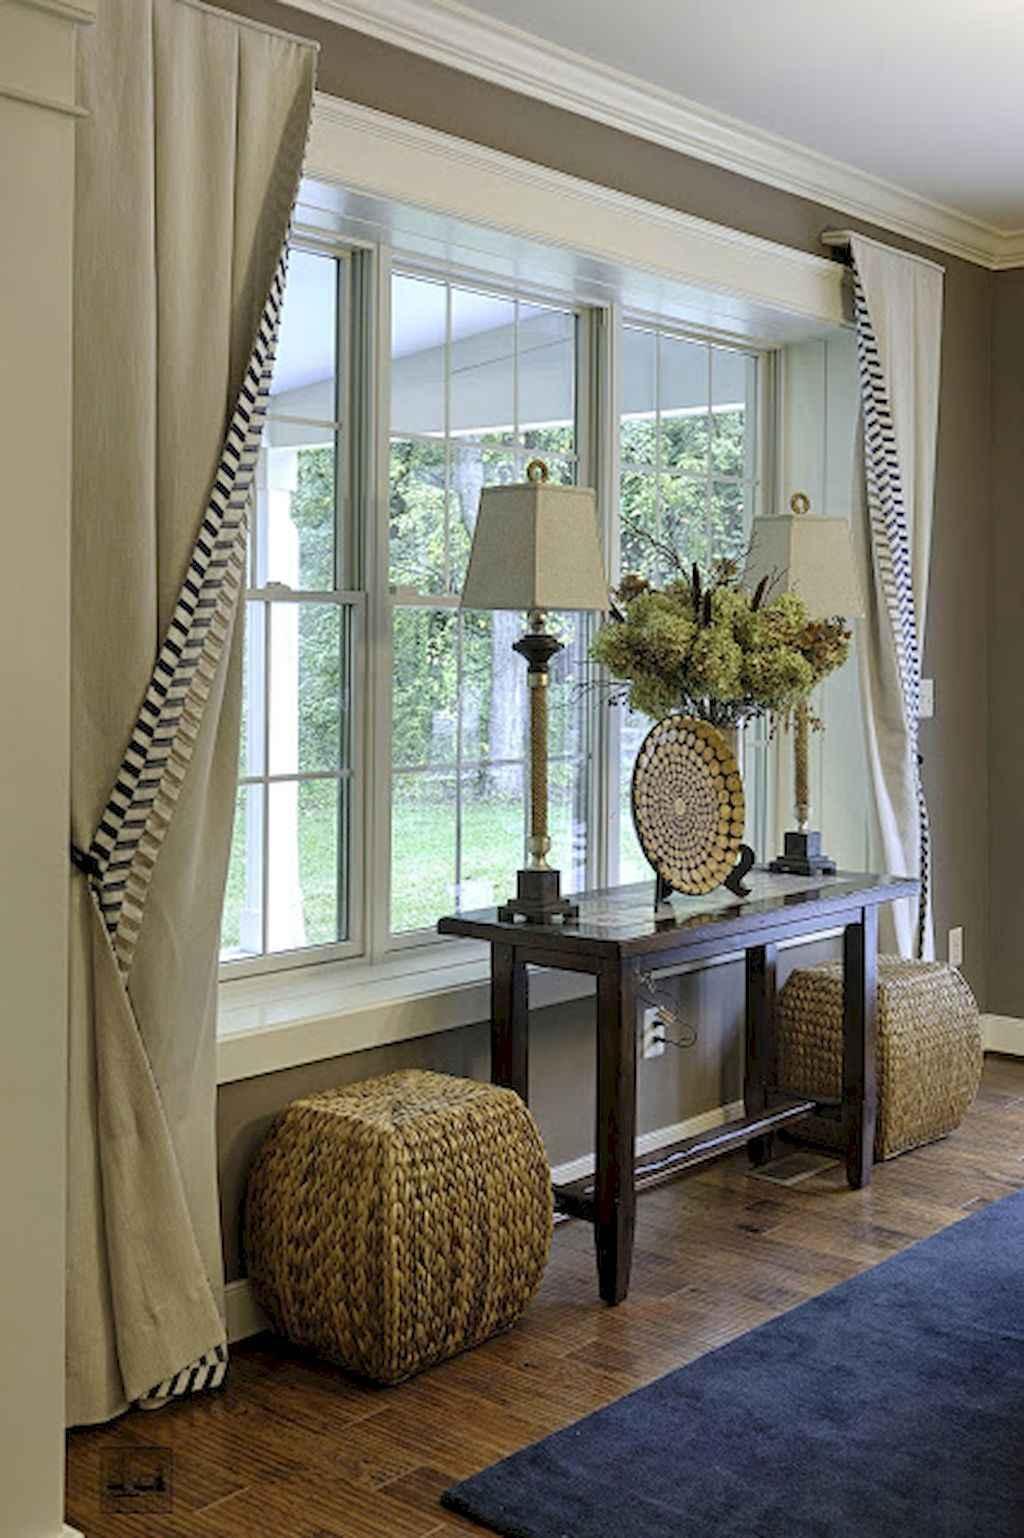 Simple clean vintage living room decorating ideas (44)